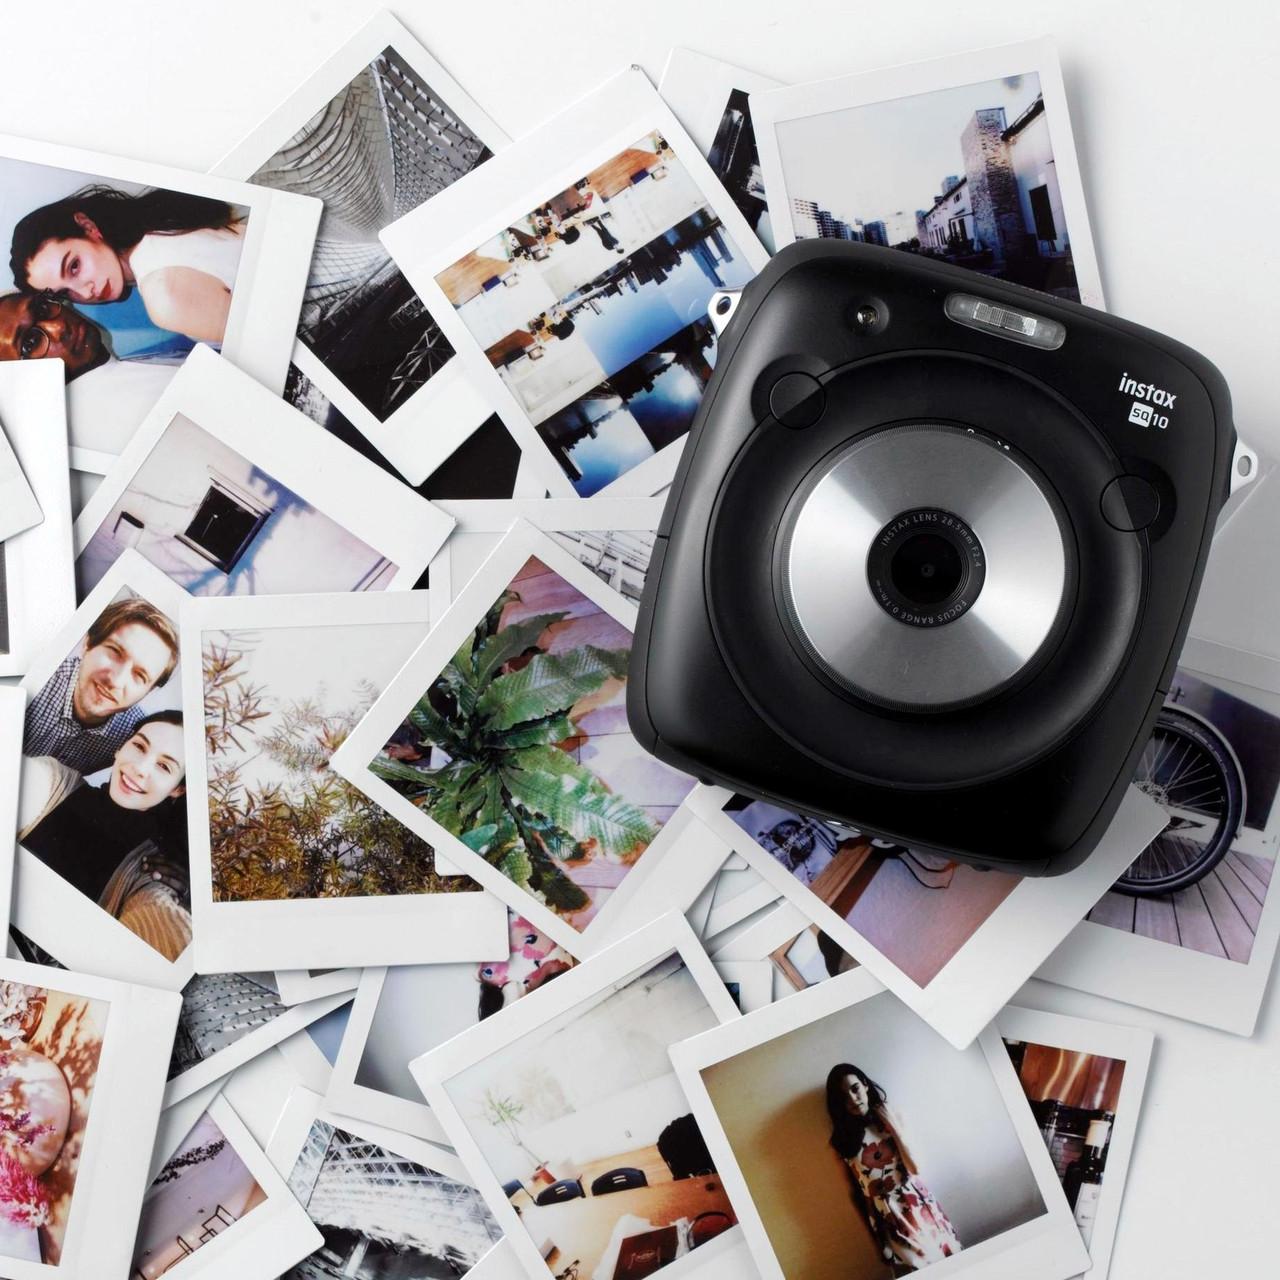 Печать фото в стиле Полароид, Polaroid 90 шт.